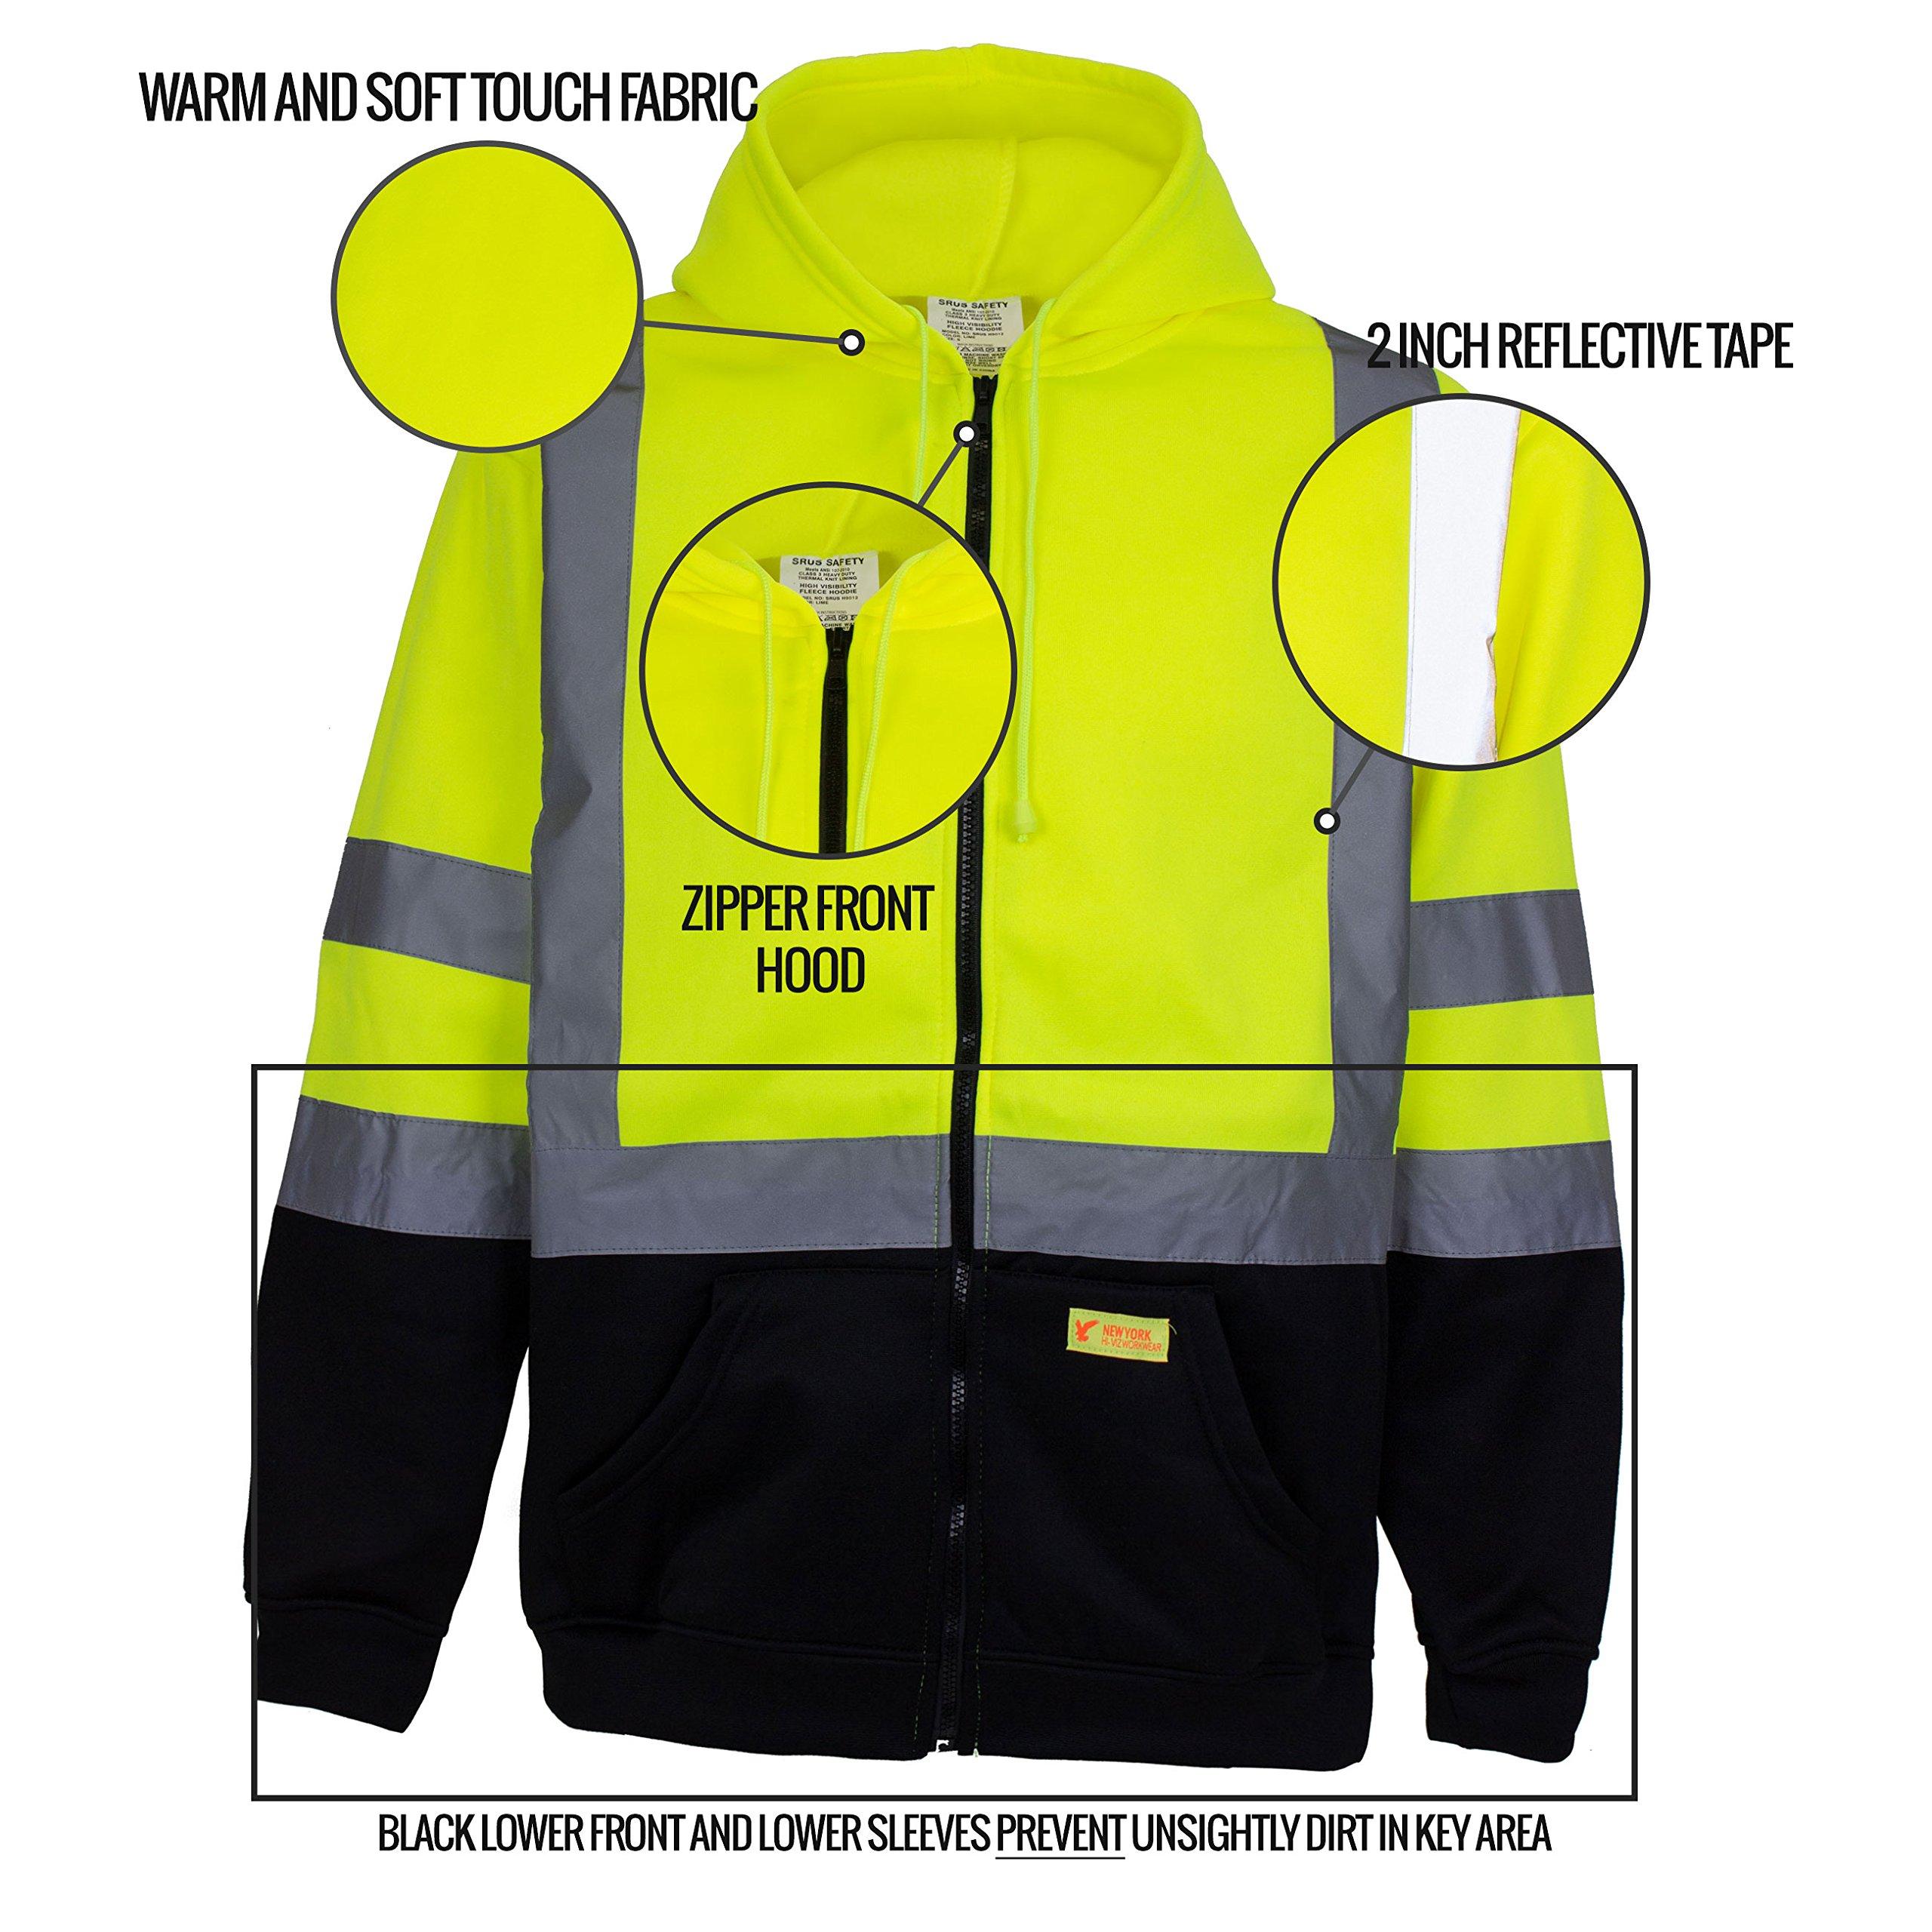 New York Hi-Viz Workwear H9012 Men's ANSI Class 3 High Visibility Class 3 Sweatshirt, Full Zip Hooded, Lightweight, Black Bottom (XX-Large) by New York Hi-Viz Workwear (Image #6)